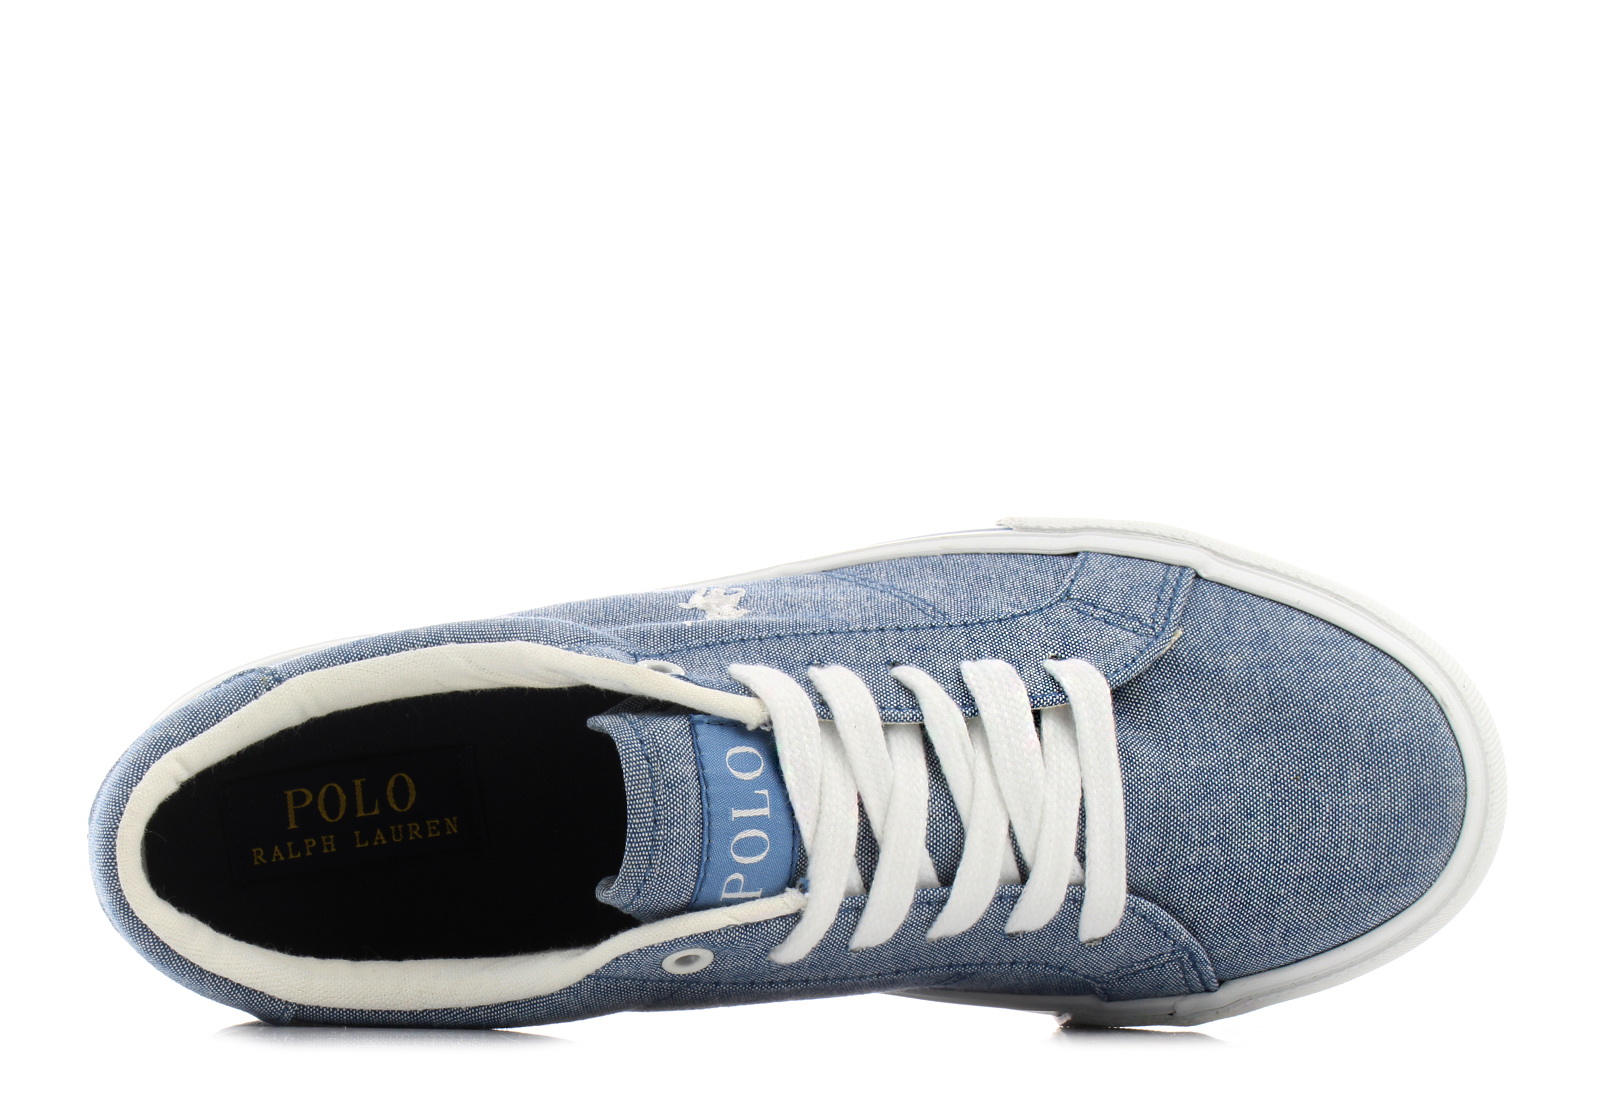 c5e4e2ef28 Polo Ralph Lauren Cipő - Edgewood - RF101550-J - Office Shoes ...